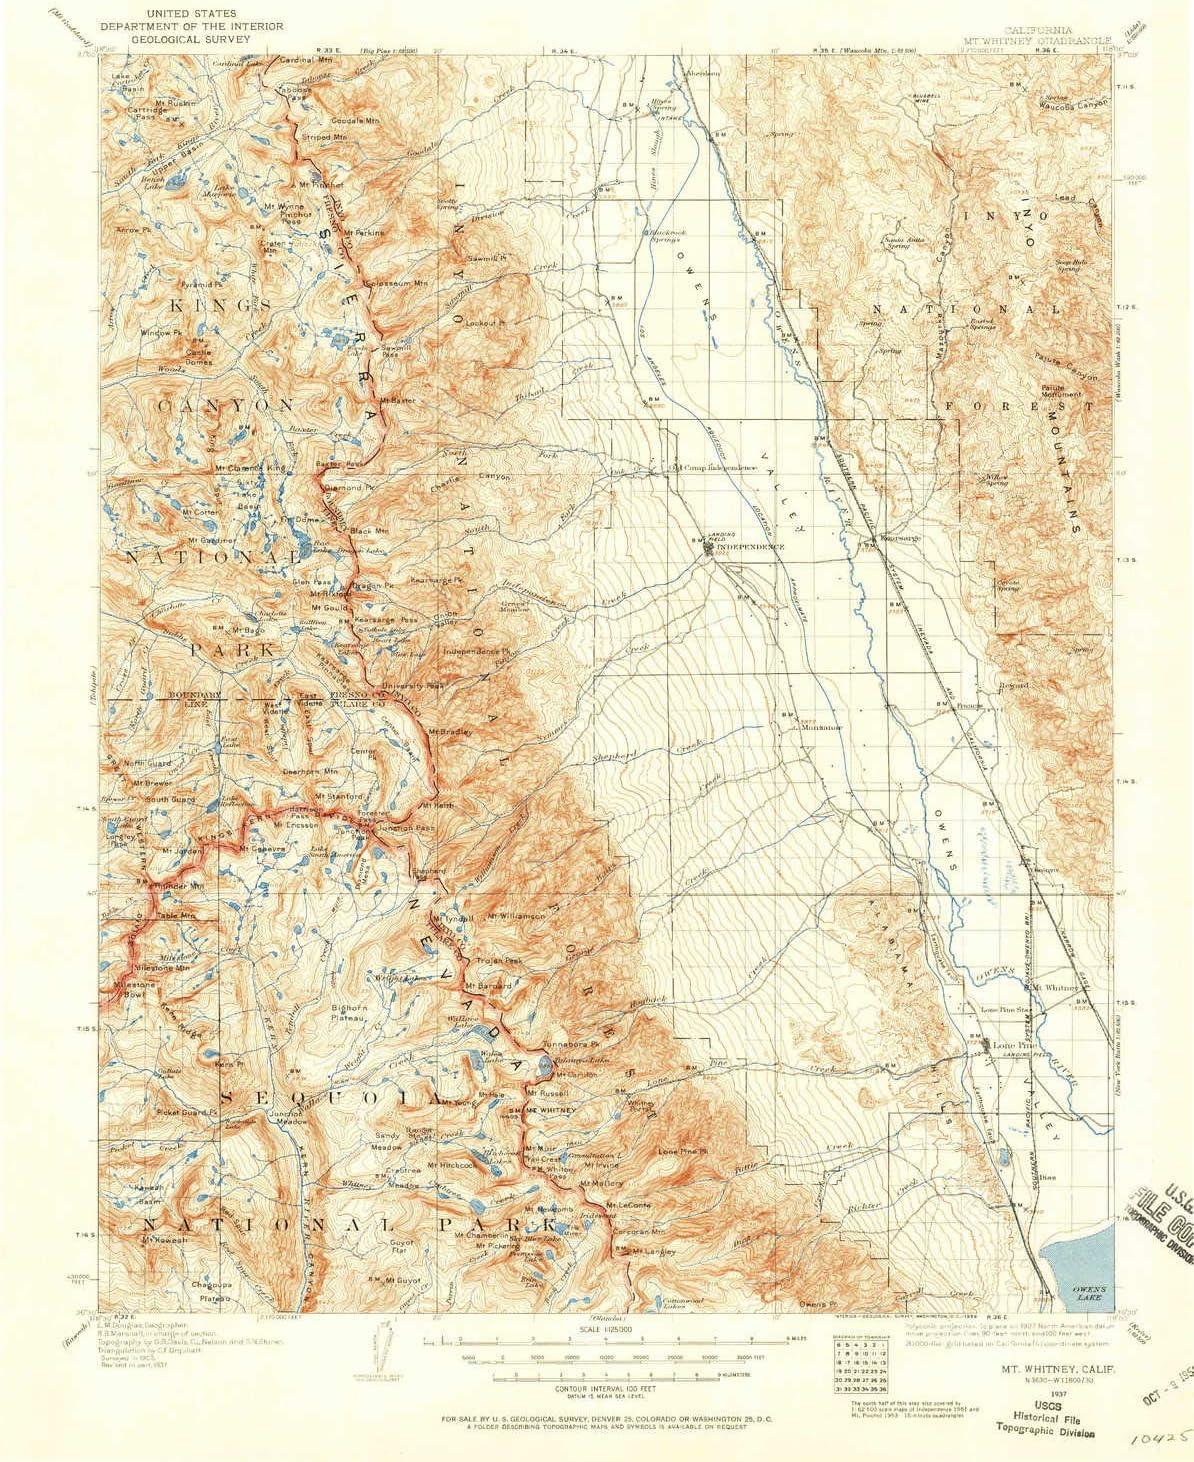 19.9 x 16.4 in 1892 1:125000 Scale Historical YellowMaps Buckingham VA topo map Updated 1929 30 X 30 Minute